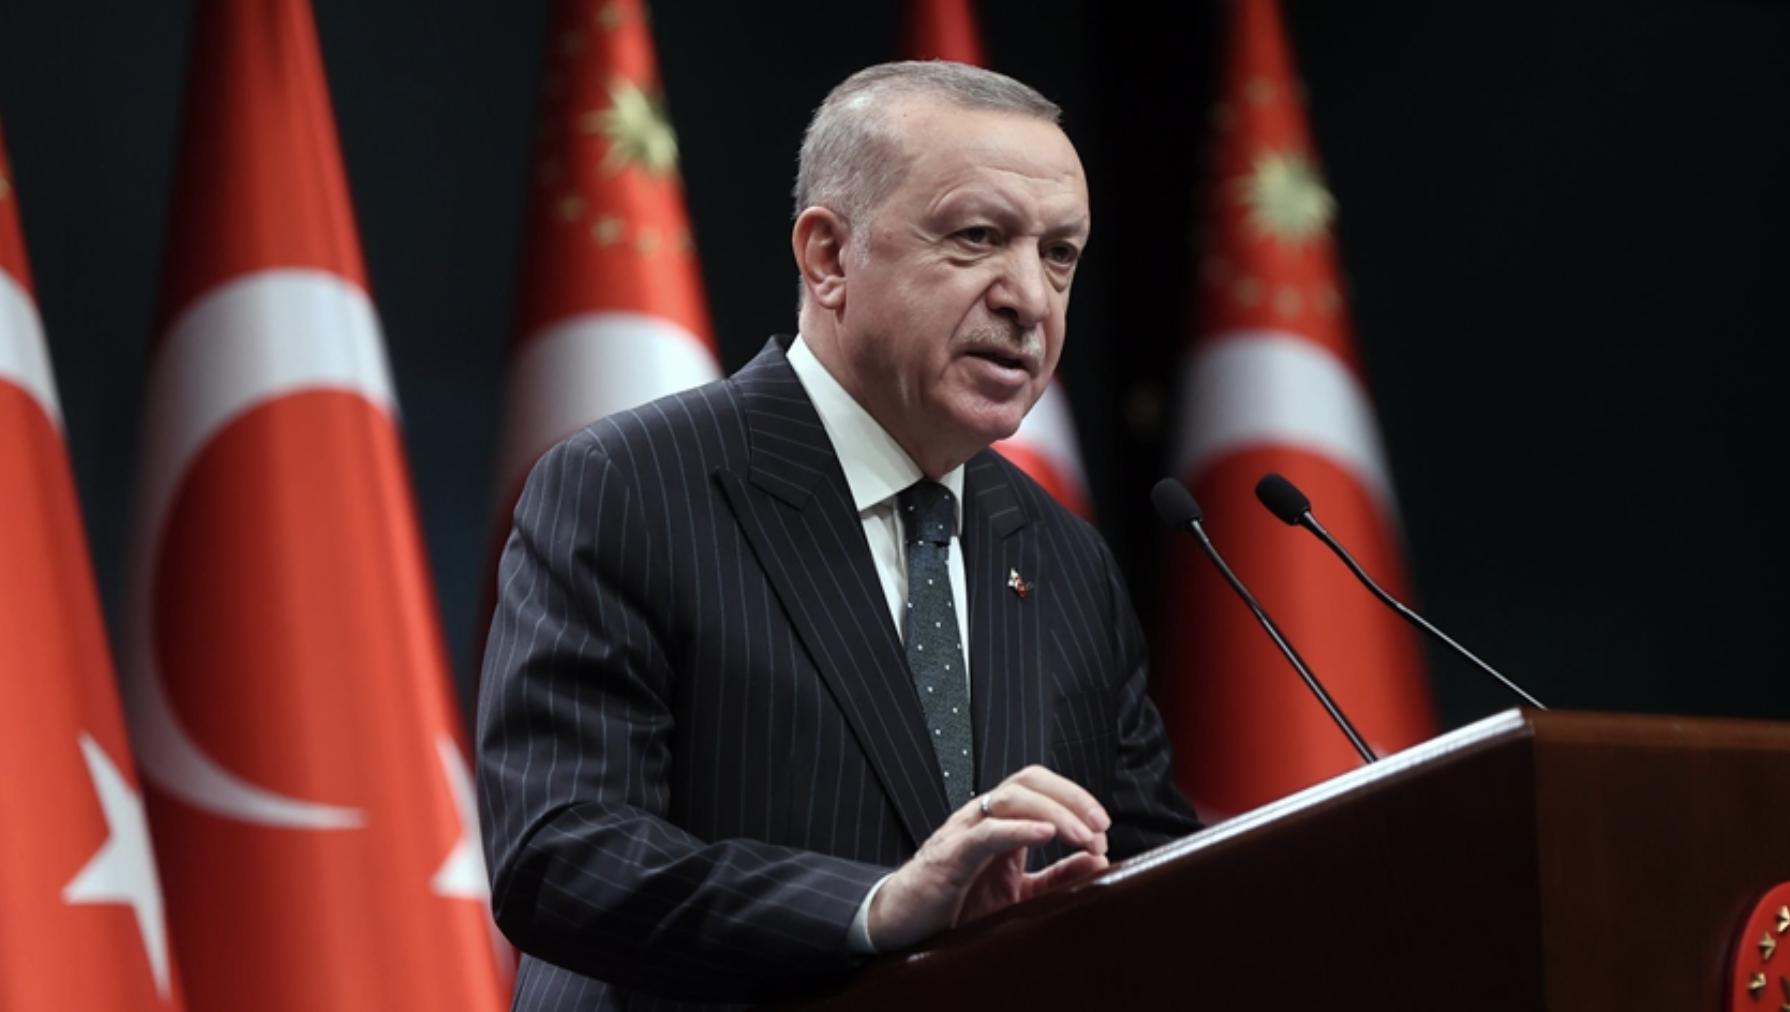 Turkey: Erdogan talks EU, Libya, Turkish Council and new restrictive measures after Cabinet meeting